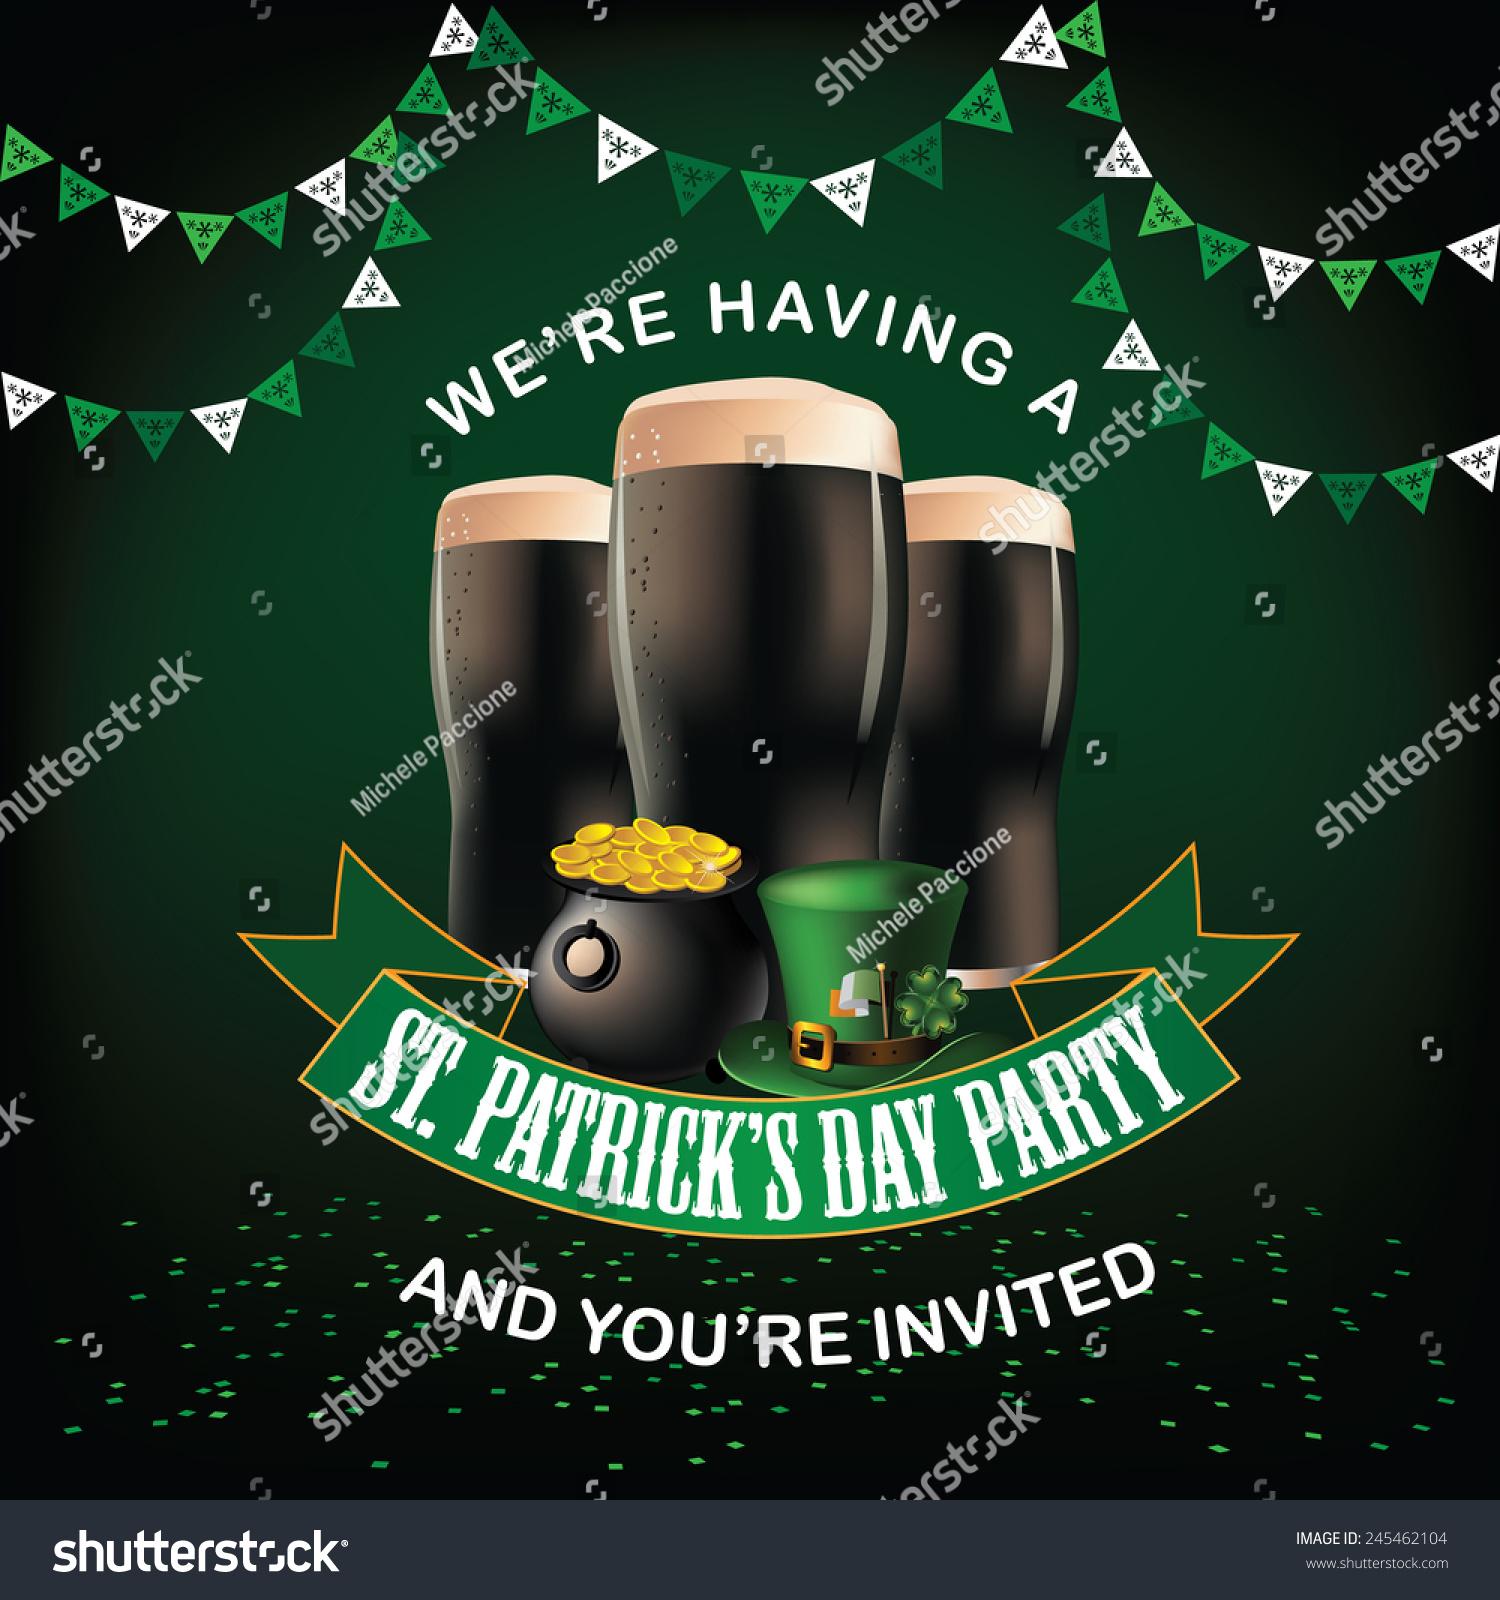 St Patricks Day Party Invitation Design Stock Vector 245462104 ...